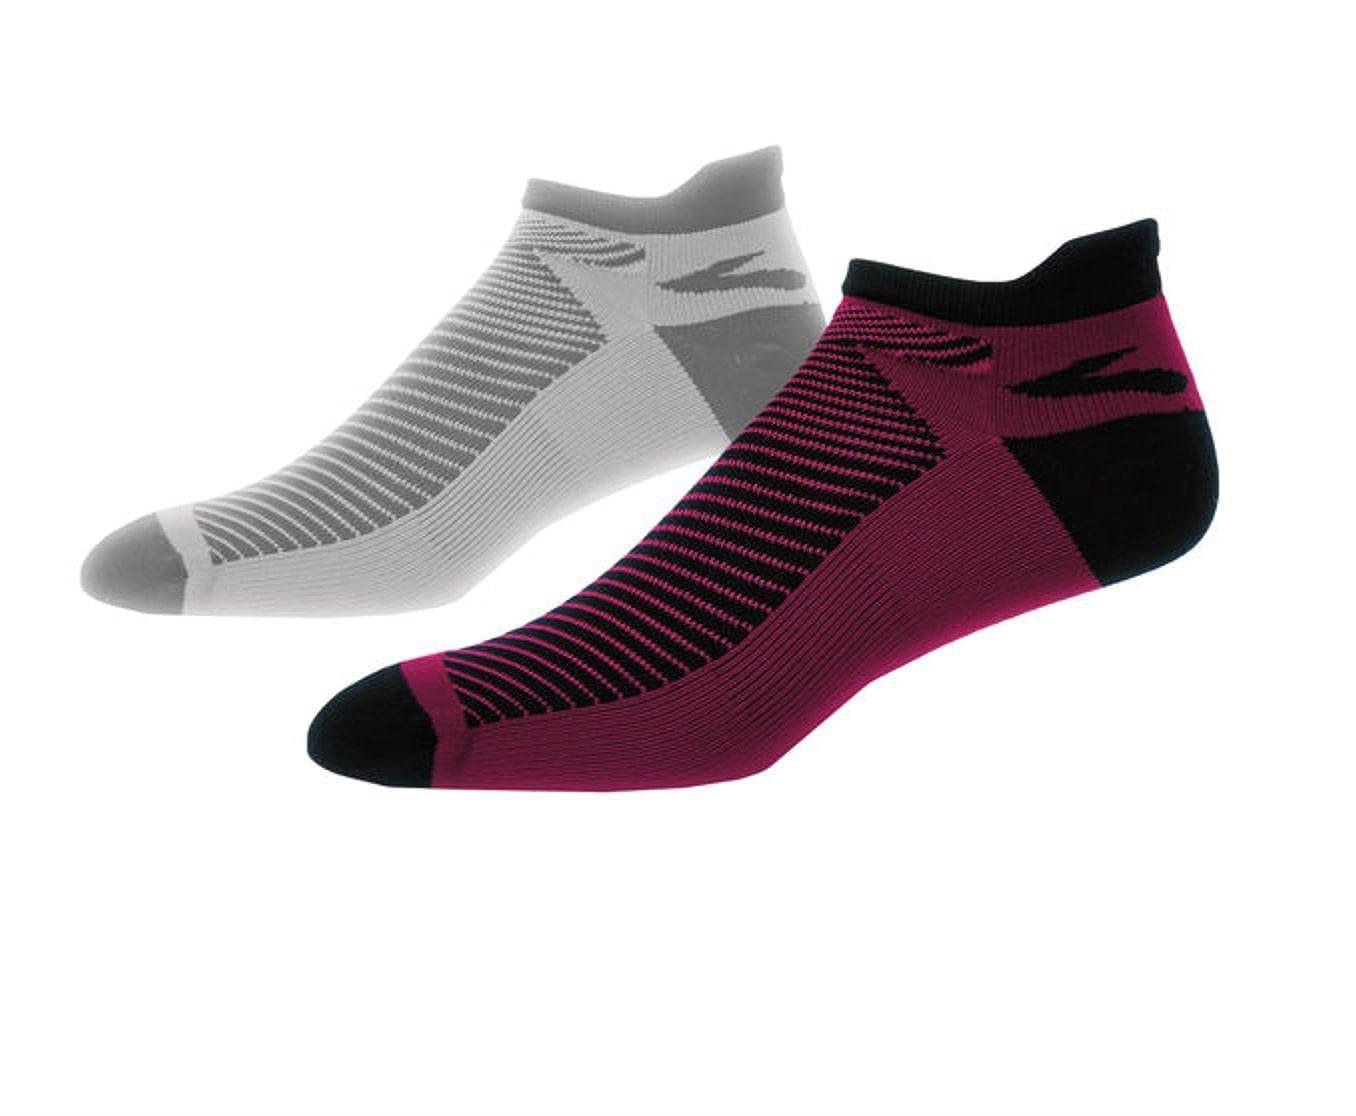 Buy Brooks Glycerin Midweight Socks